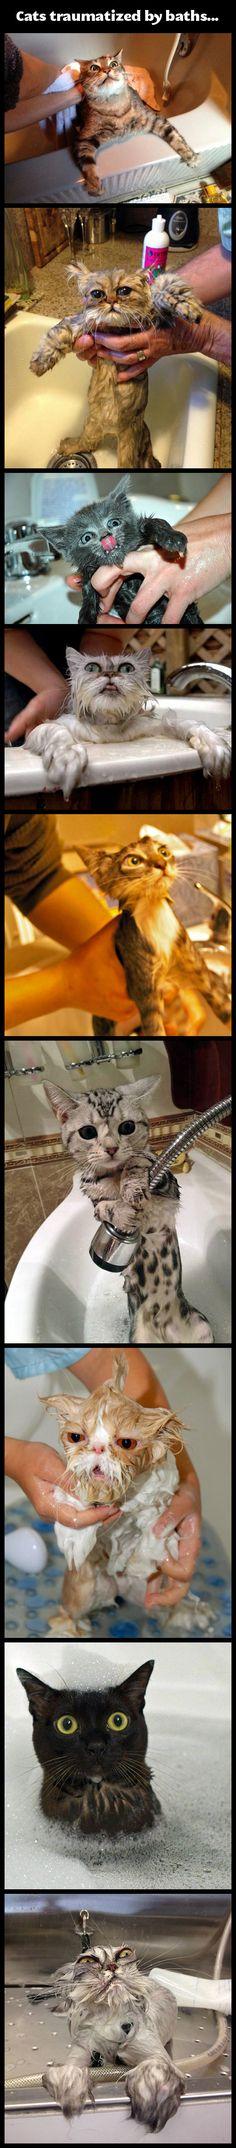 omg the last cat lol